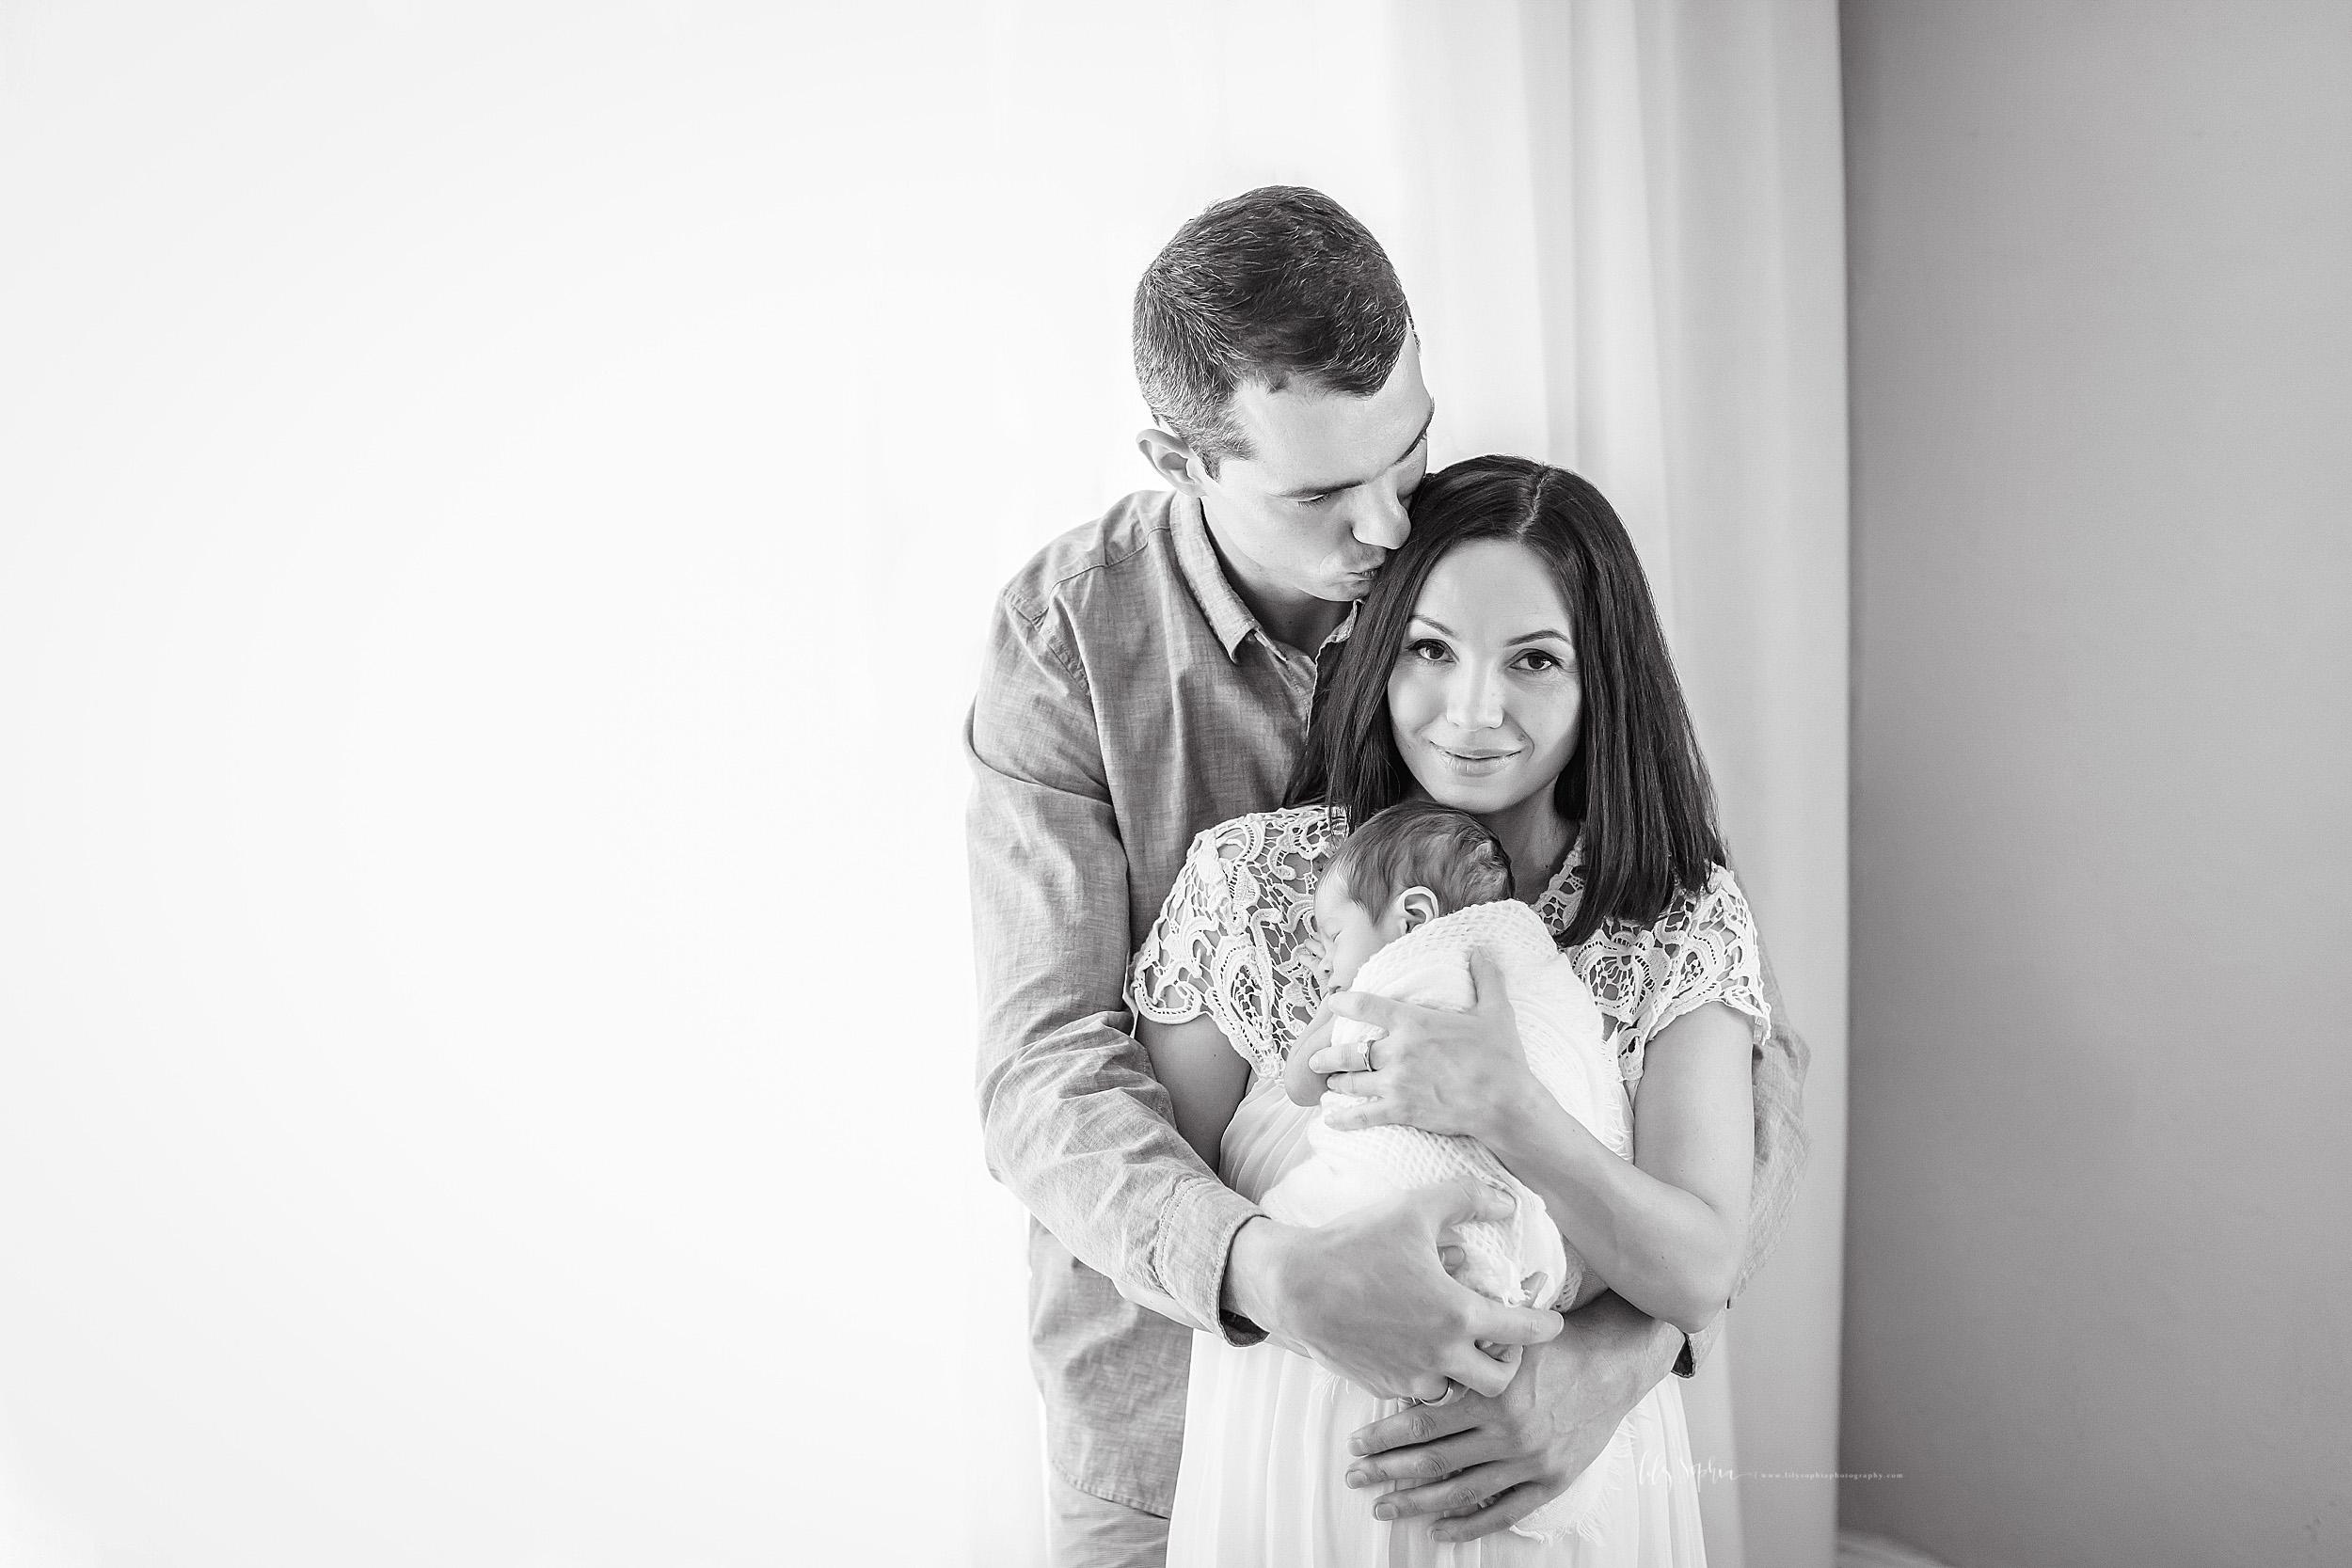 atlanta-brookhaven-decatur-sandy-springs-buckhead-virginia-highlands-west-end-decatur-lily-sophia-photography-ukraine-family-newborn-baby-boy-studio-photos_1510.jpg